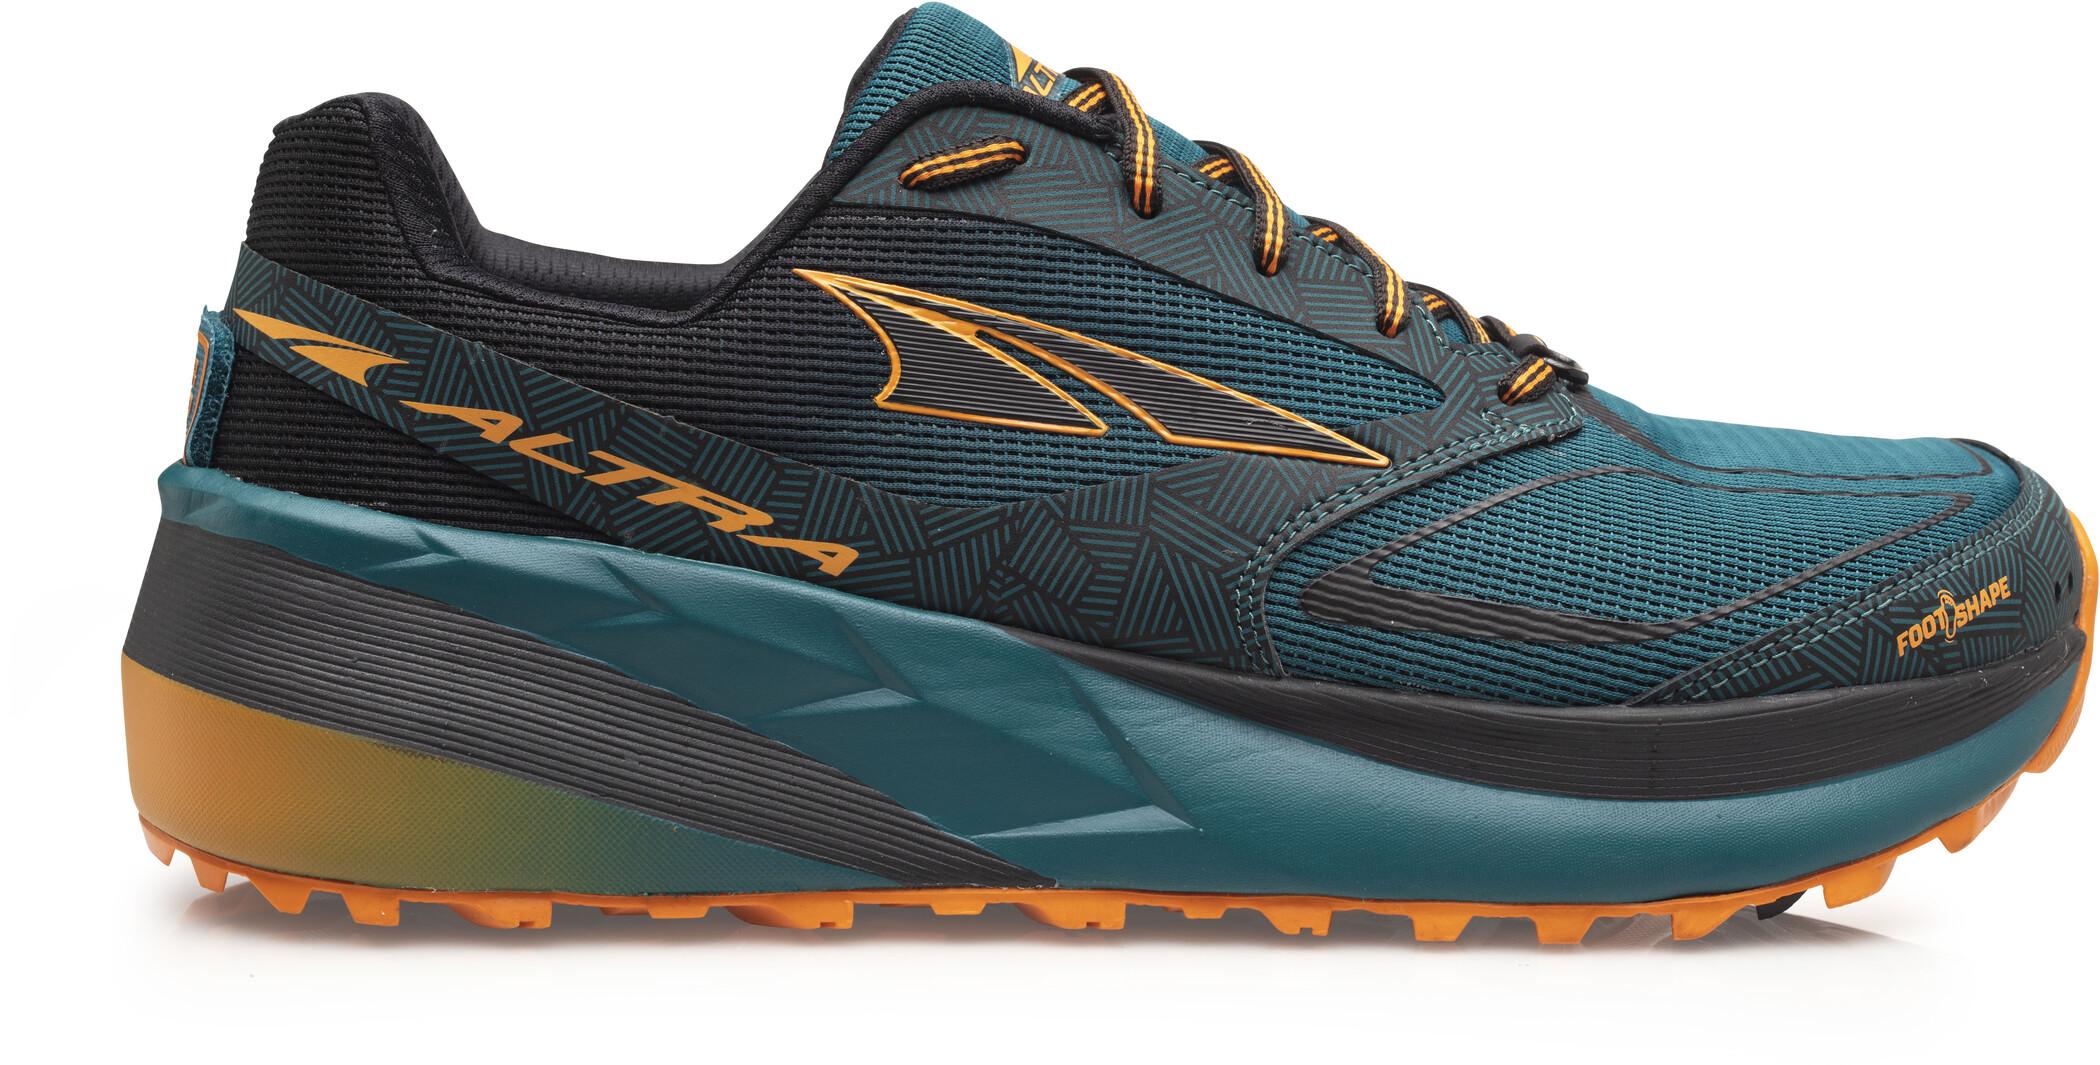 Altra Olympus 3.5 Trail Running Shoes Herr greenorange